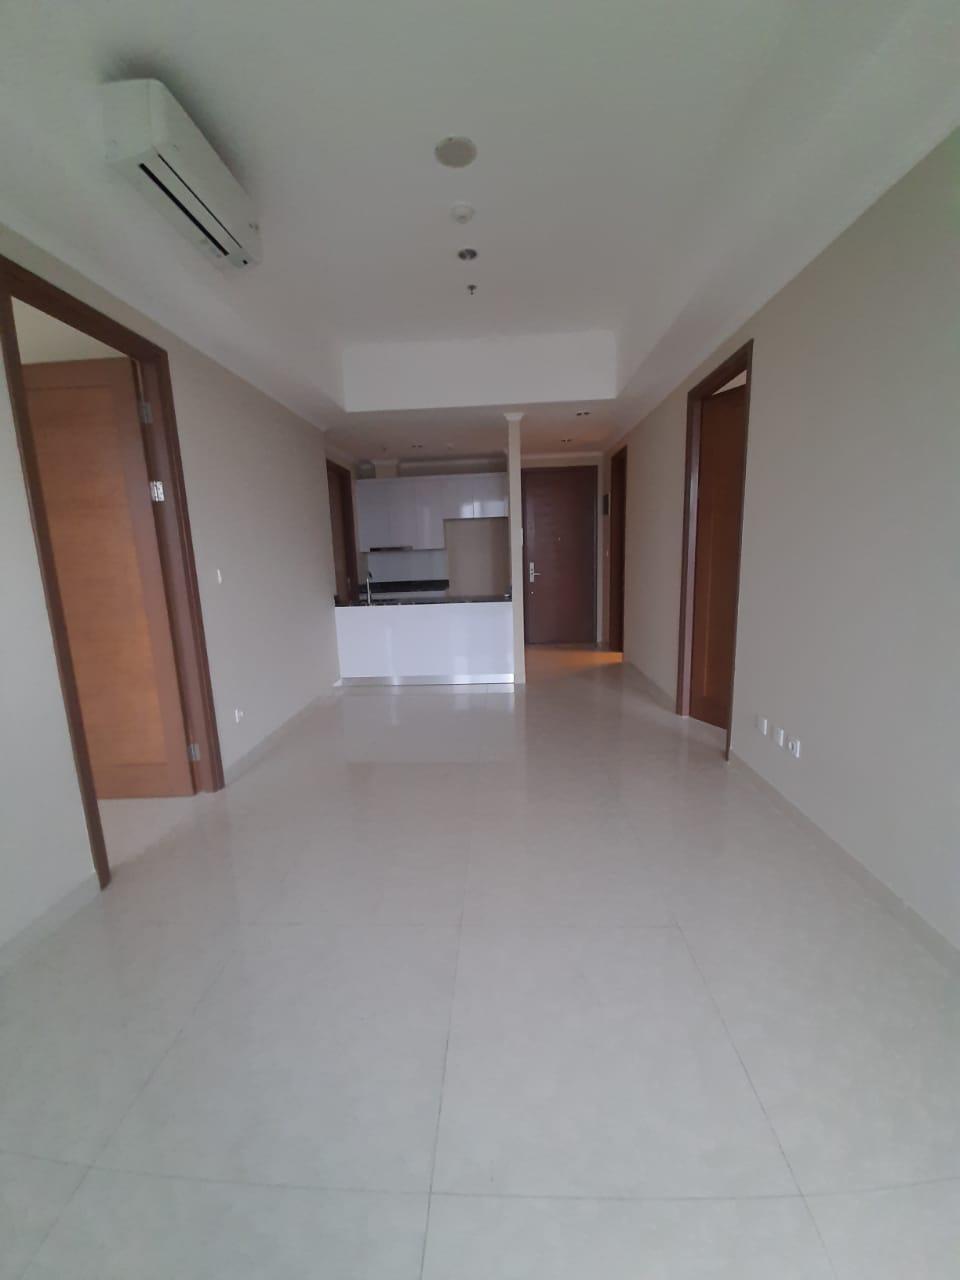 Taman Anggrek Residence 2BR+1 Tower Azalea Semi Furnished